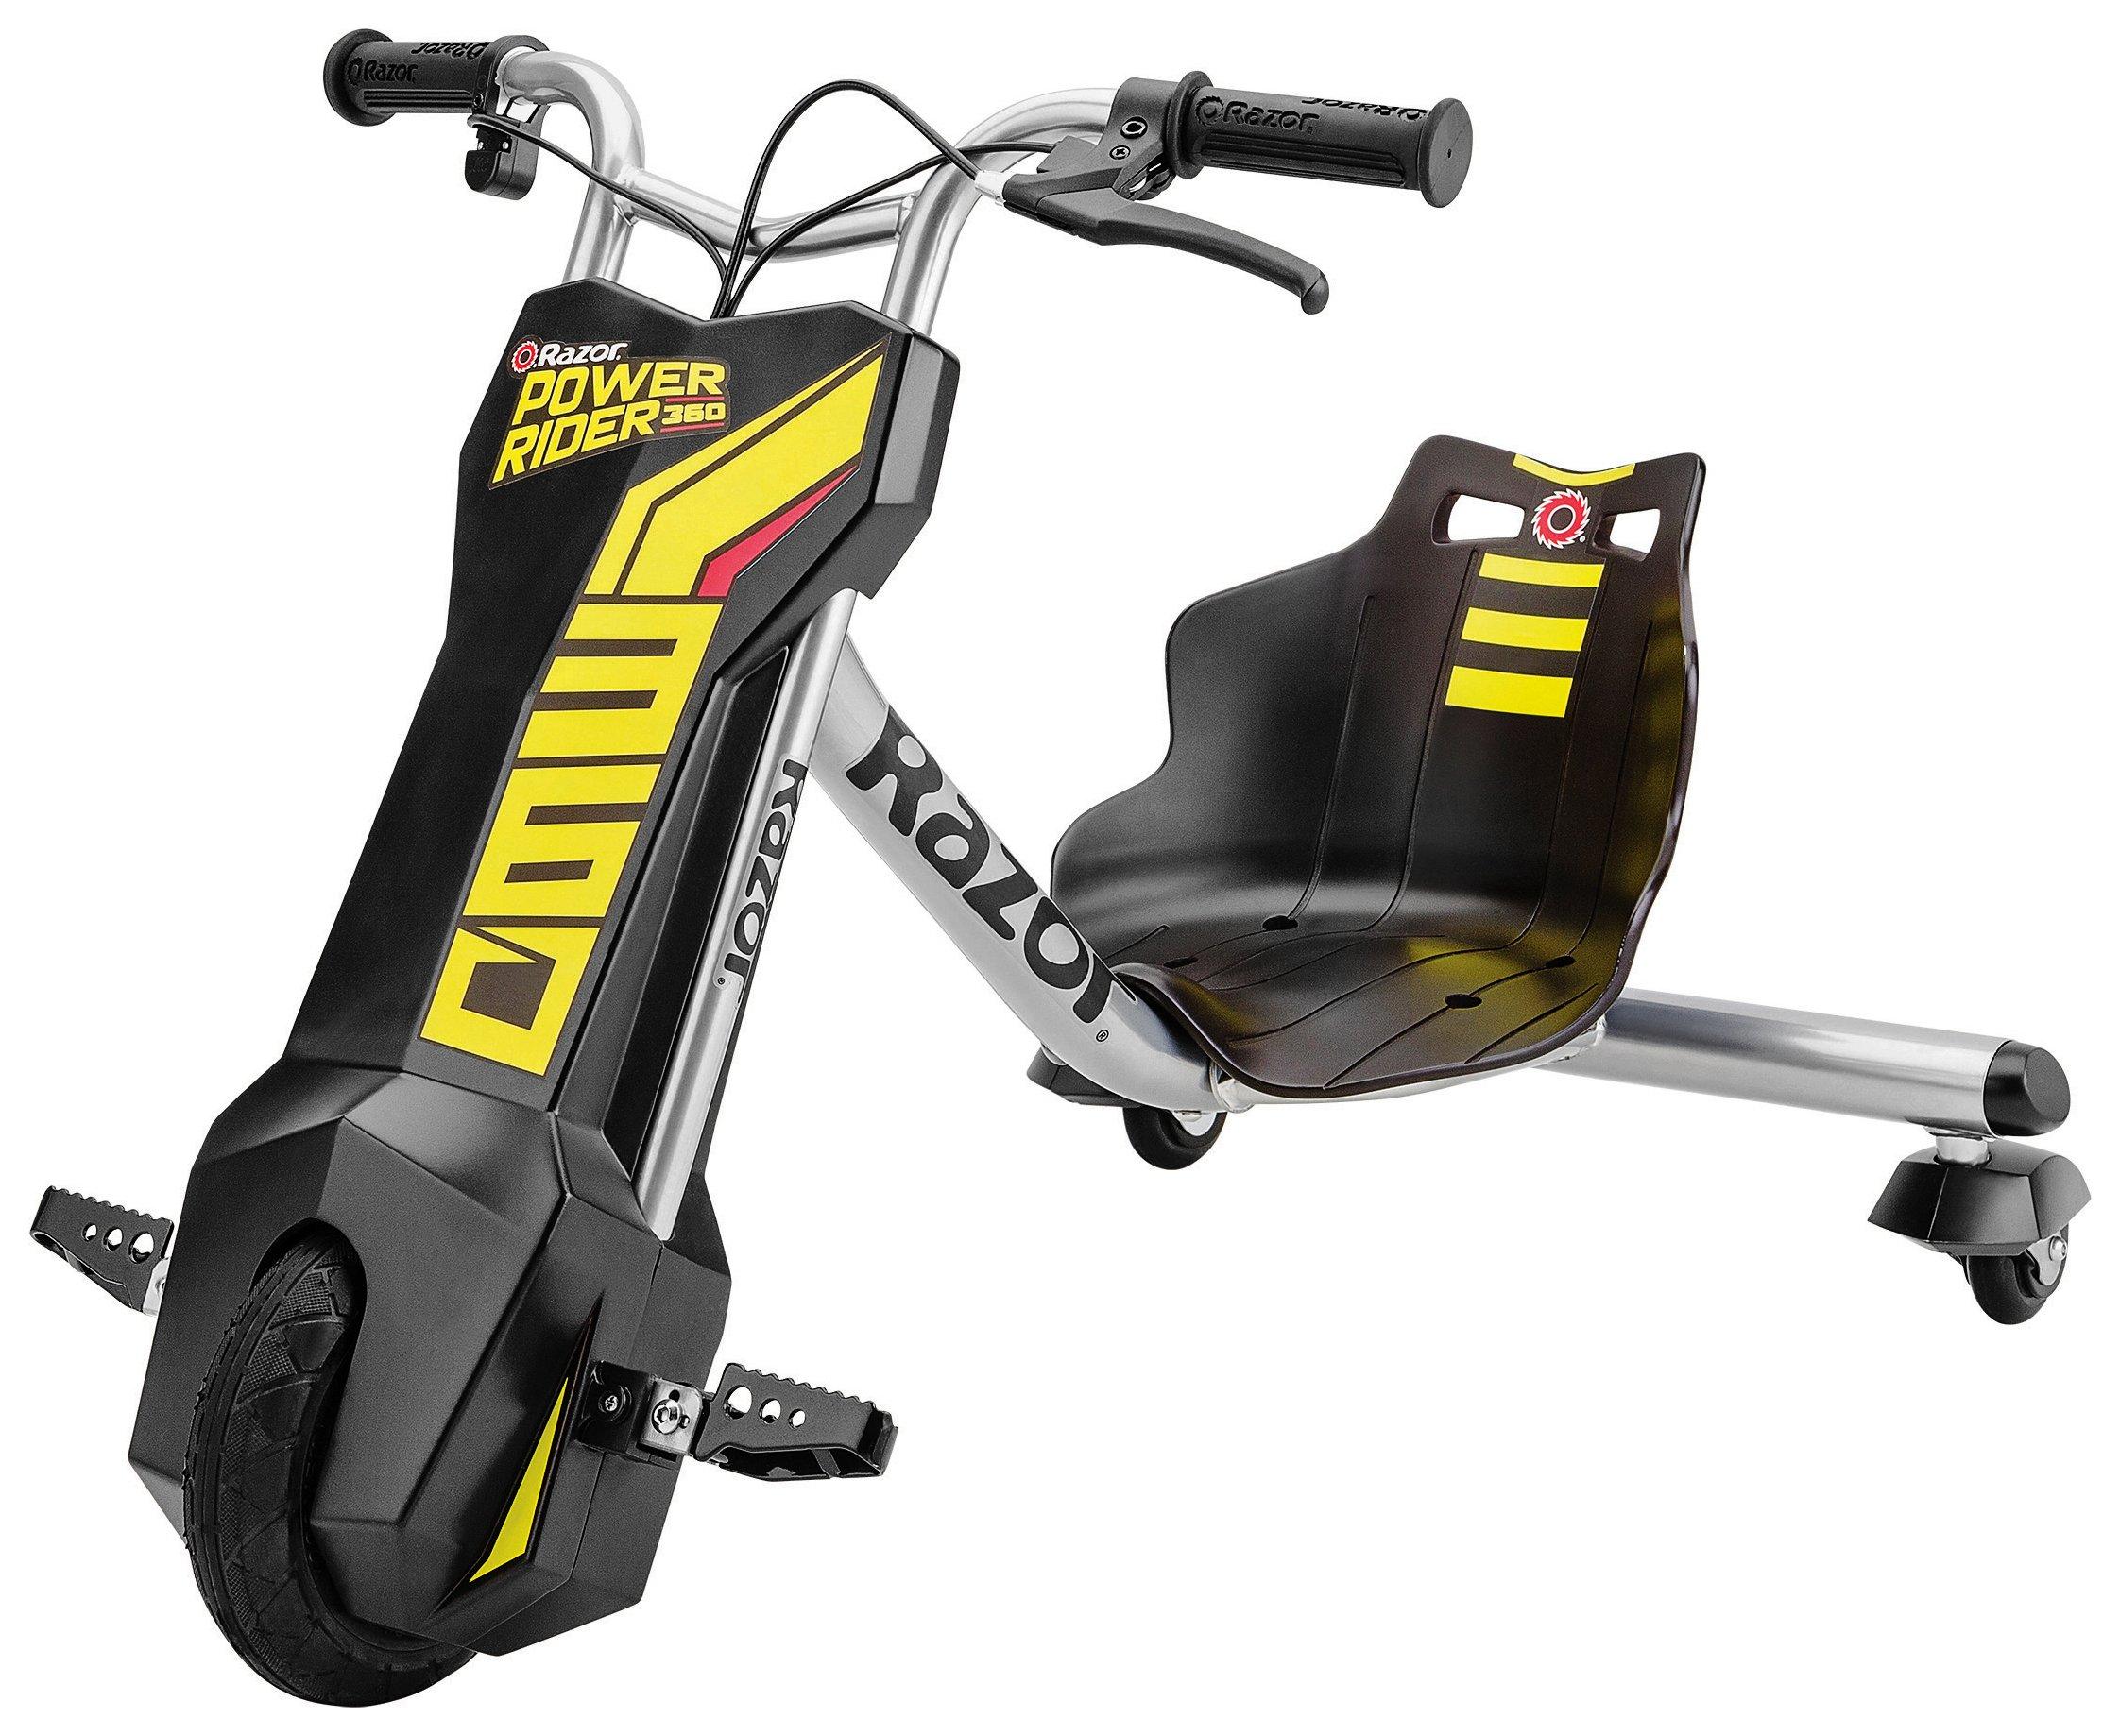 Razor - Power Rider 360 Electric - Scooter